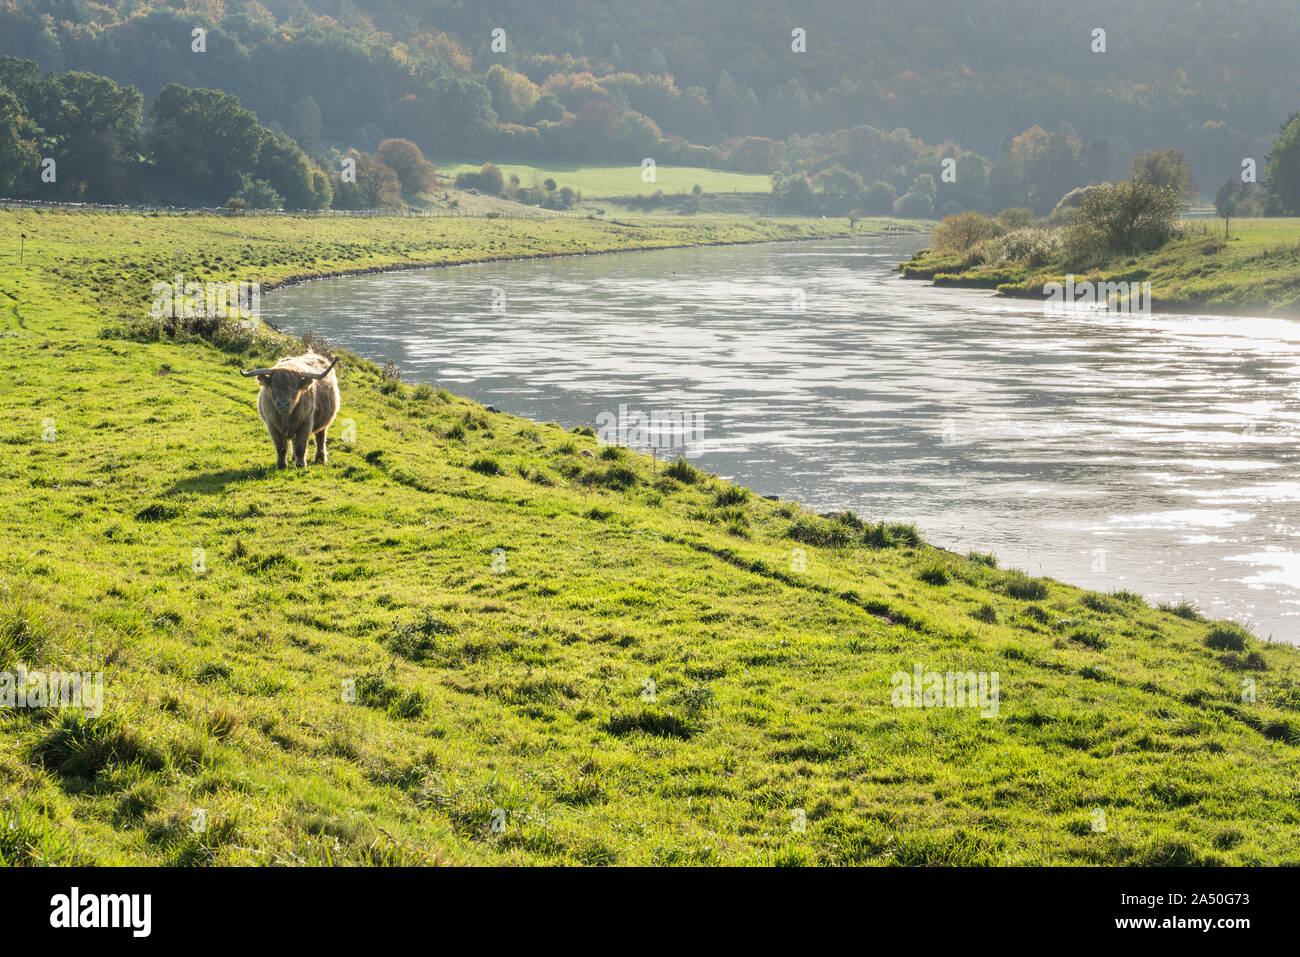 Highland cattle, Oberweser, Weser Uplands, Weserbergland, Hesse, Germany Stock Photo